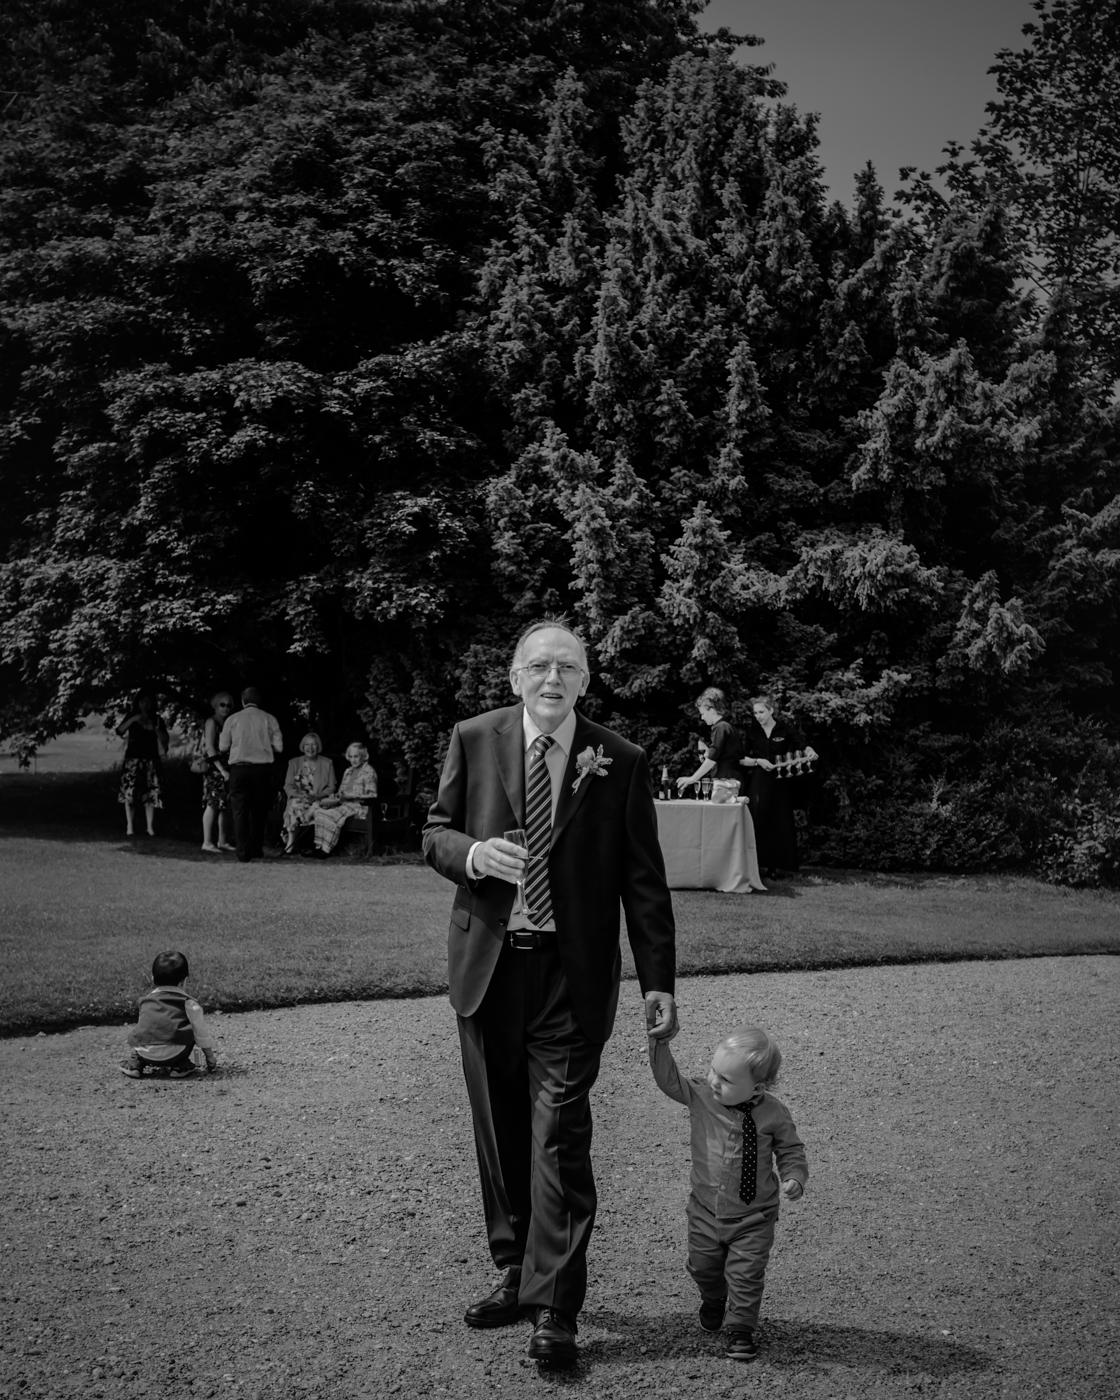 097 - Abi and Chris at Kedleston Hall - Wedding Photography by Mark Pugh www.markpugh.com - 0371.JPG